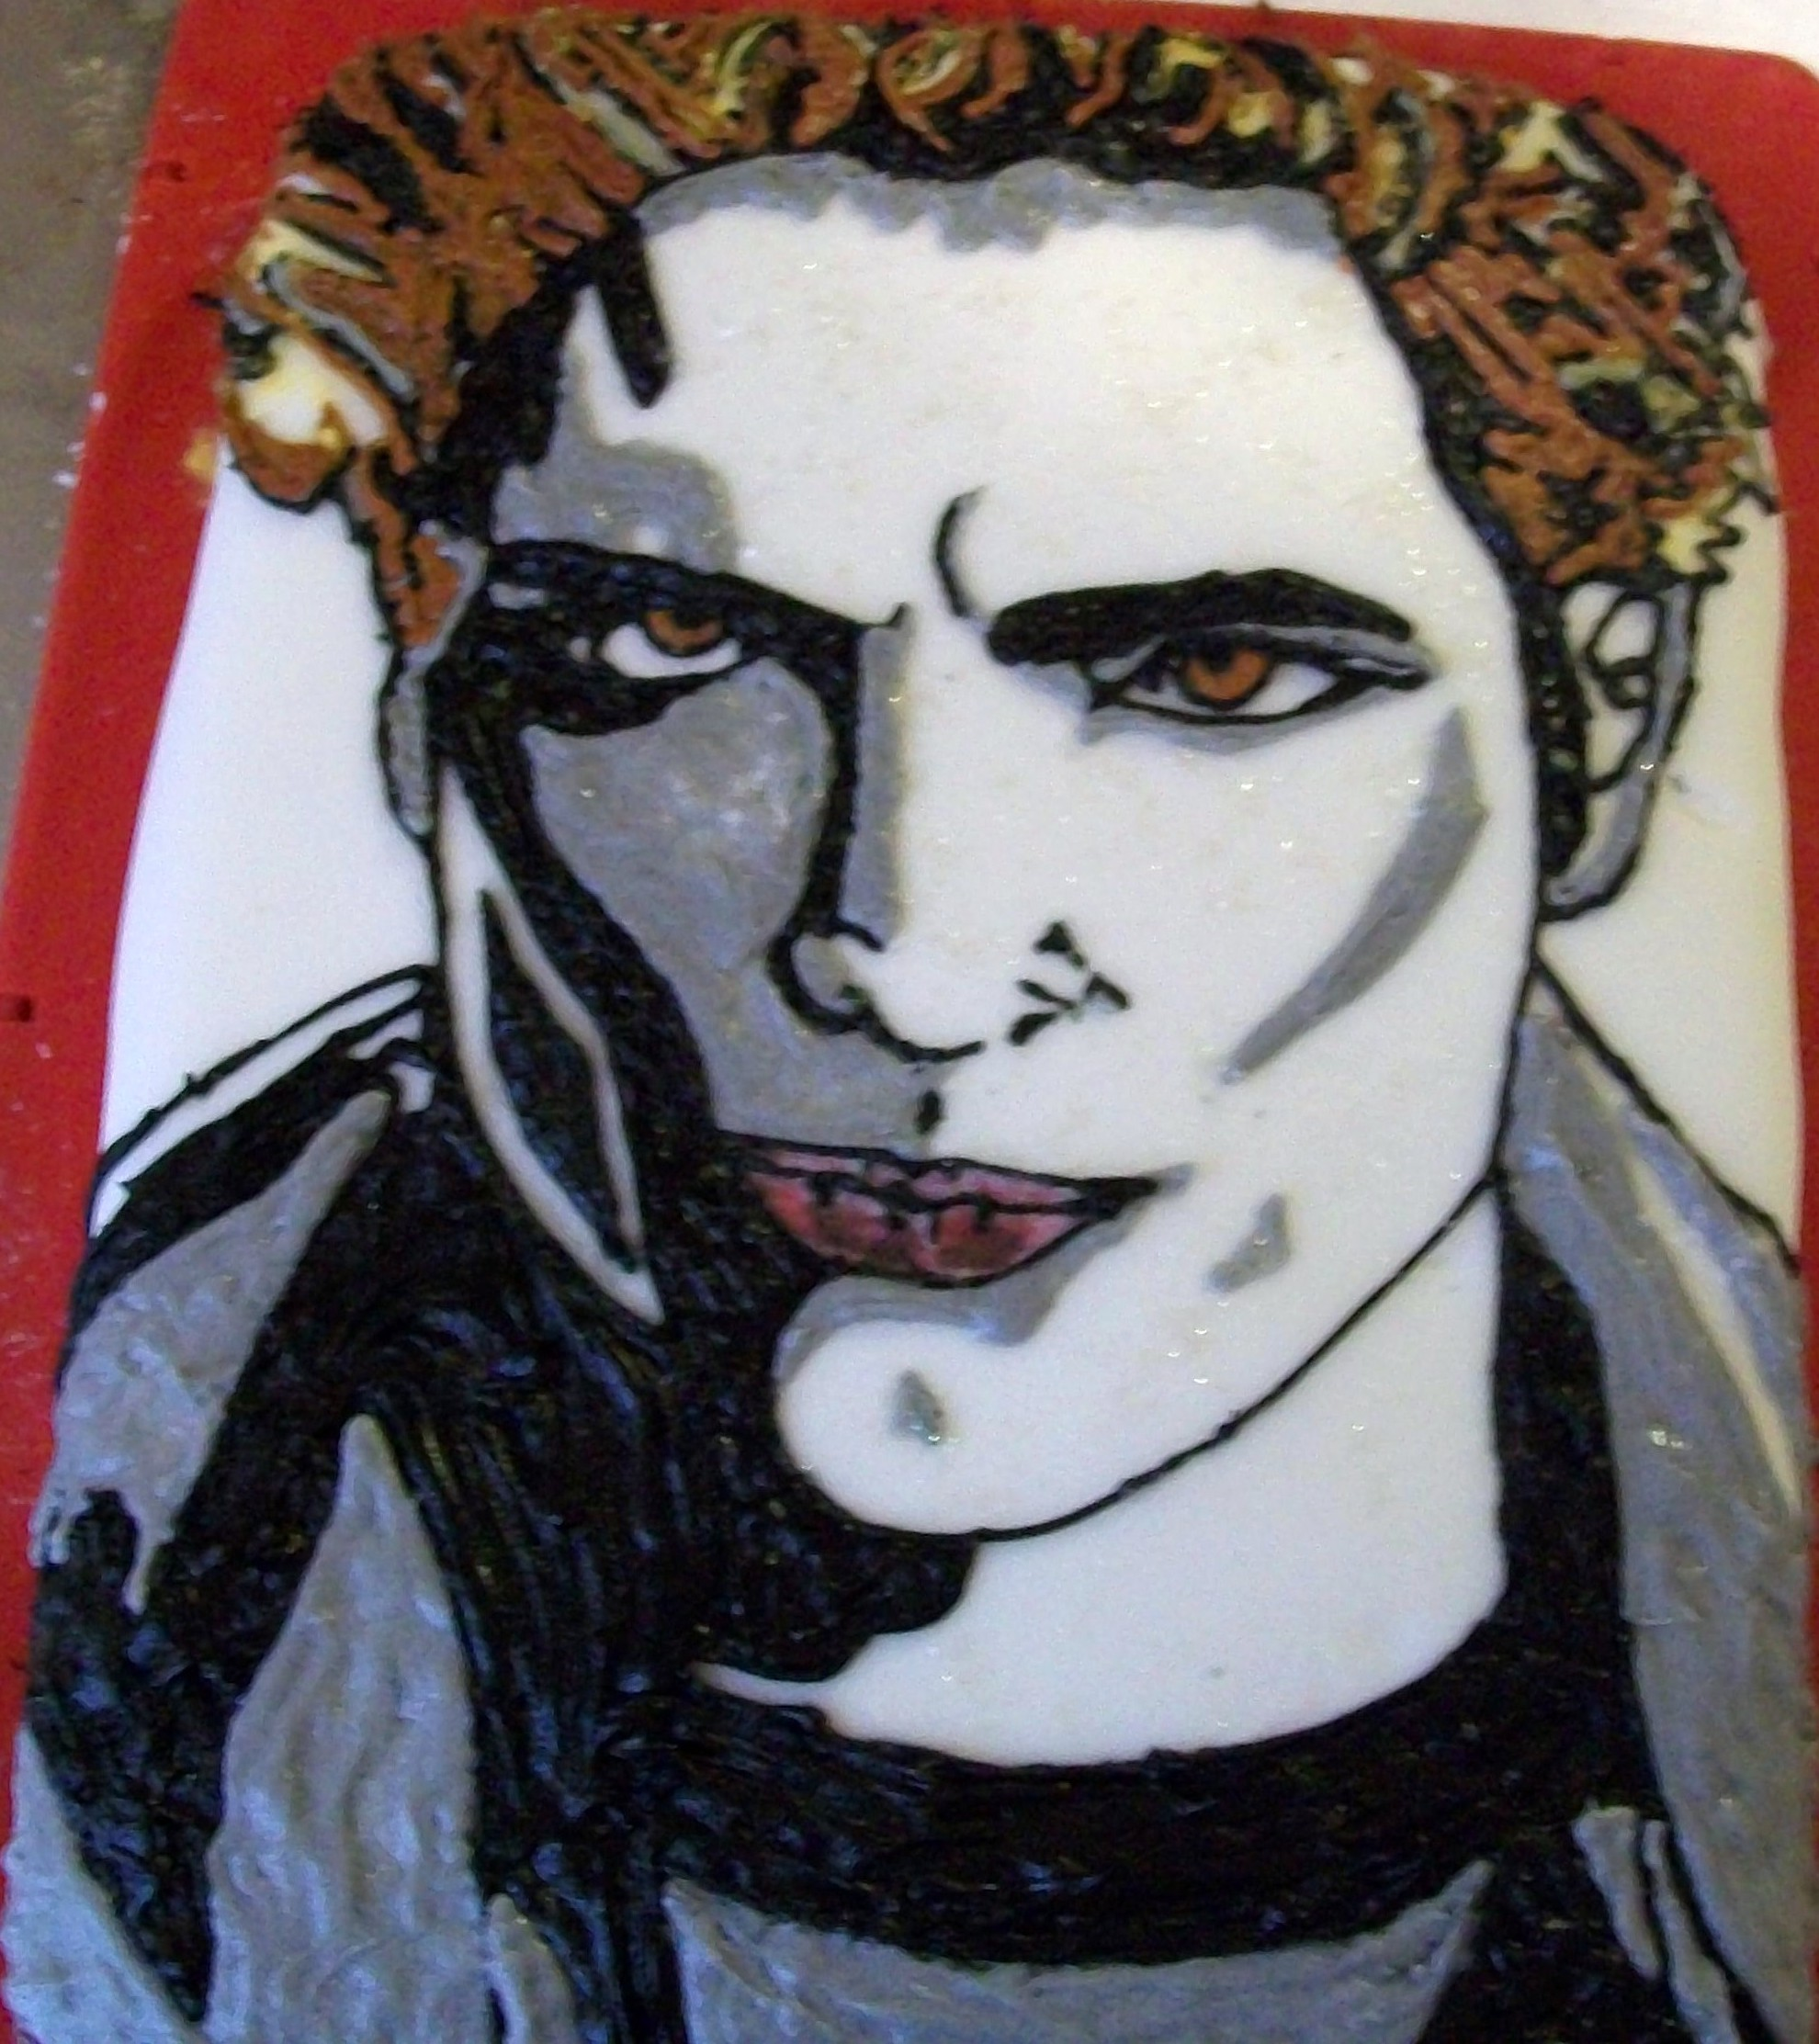 Edward Cullen Cake